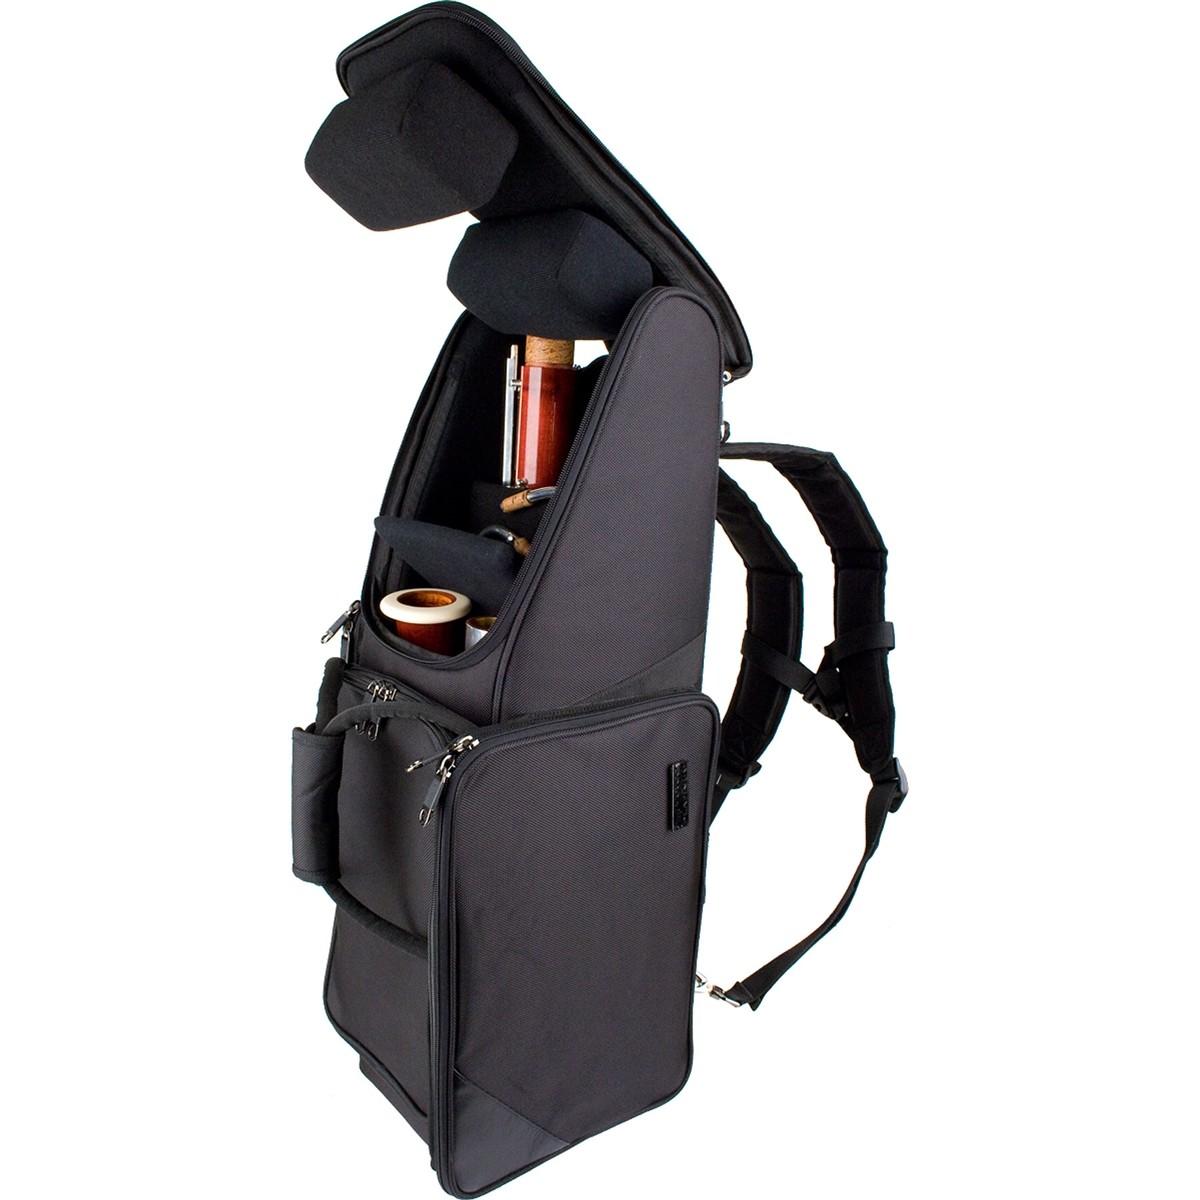 Protec Bassoon Gig Bag - Platinum Series (PL252)